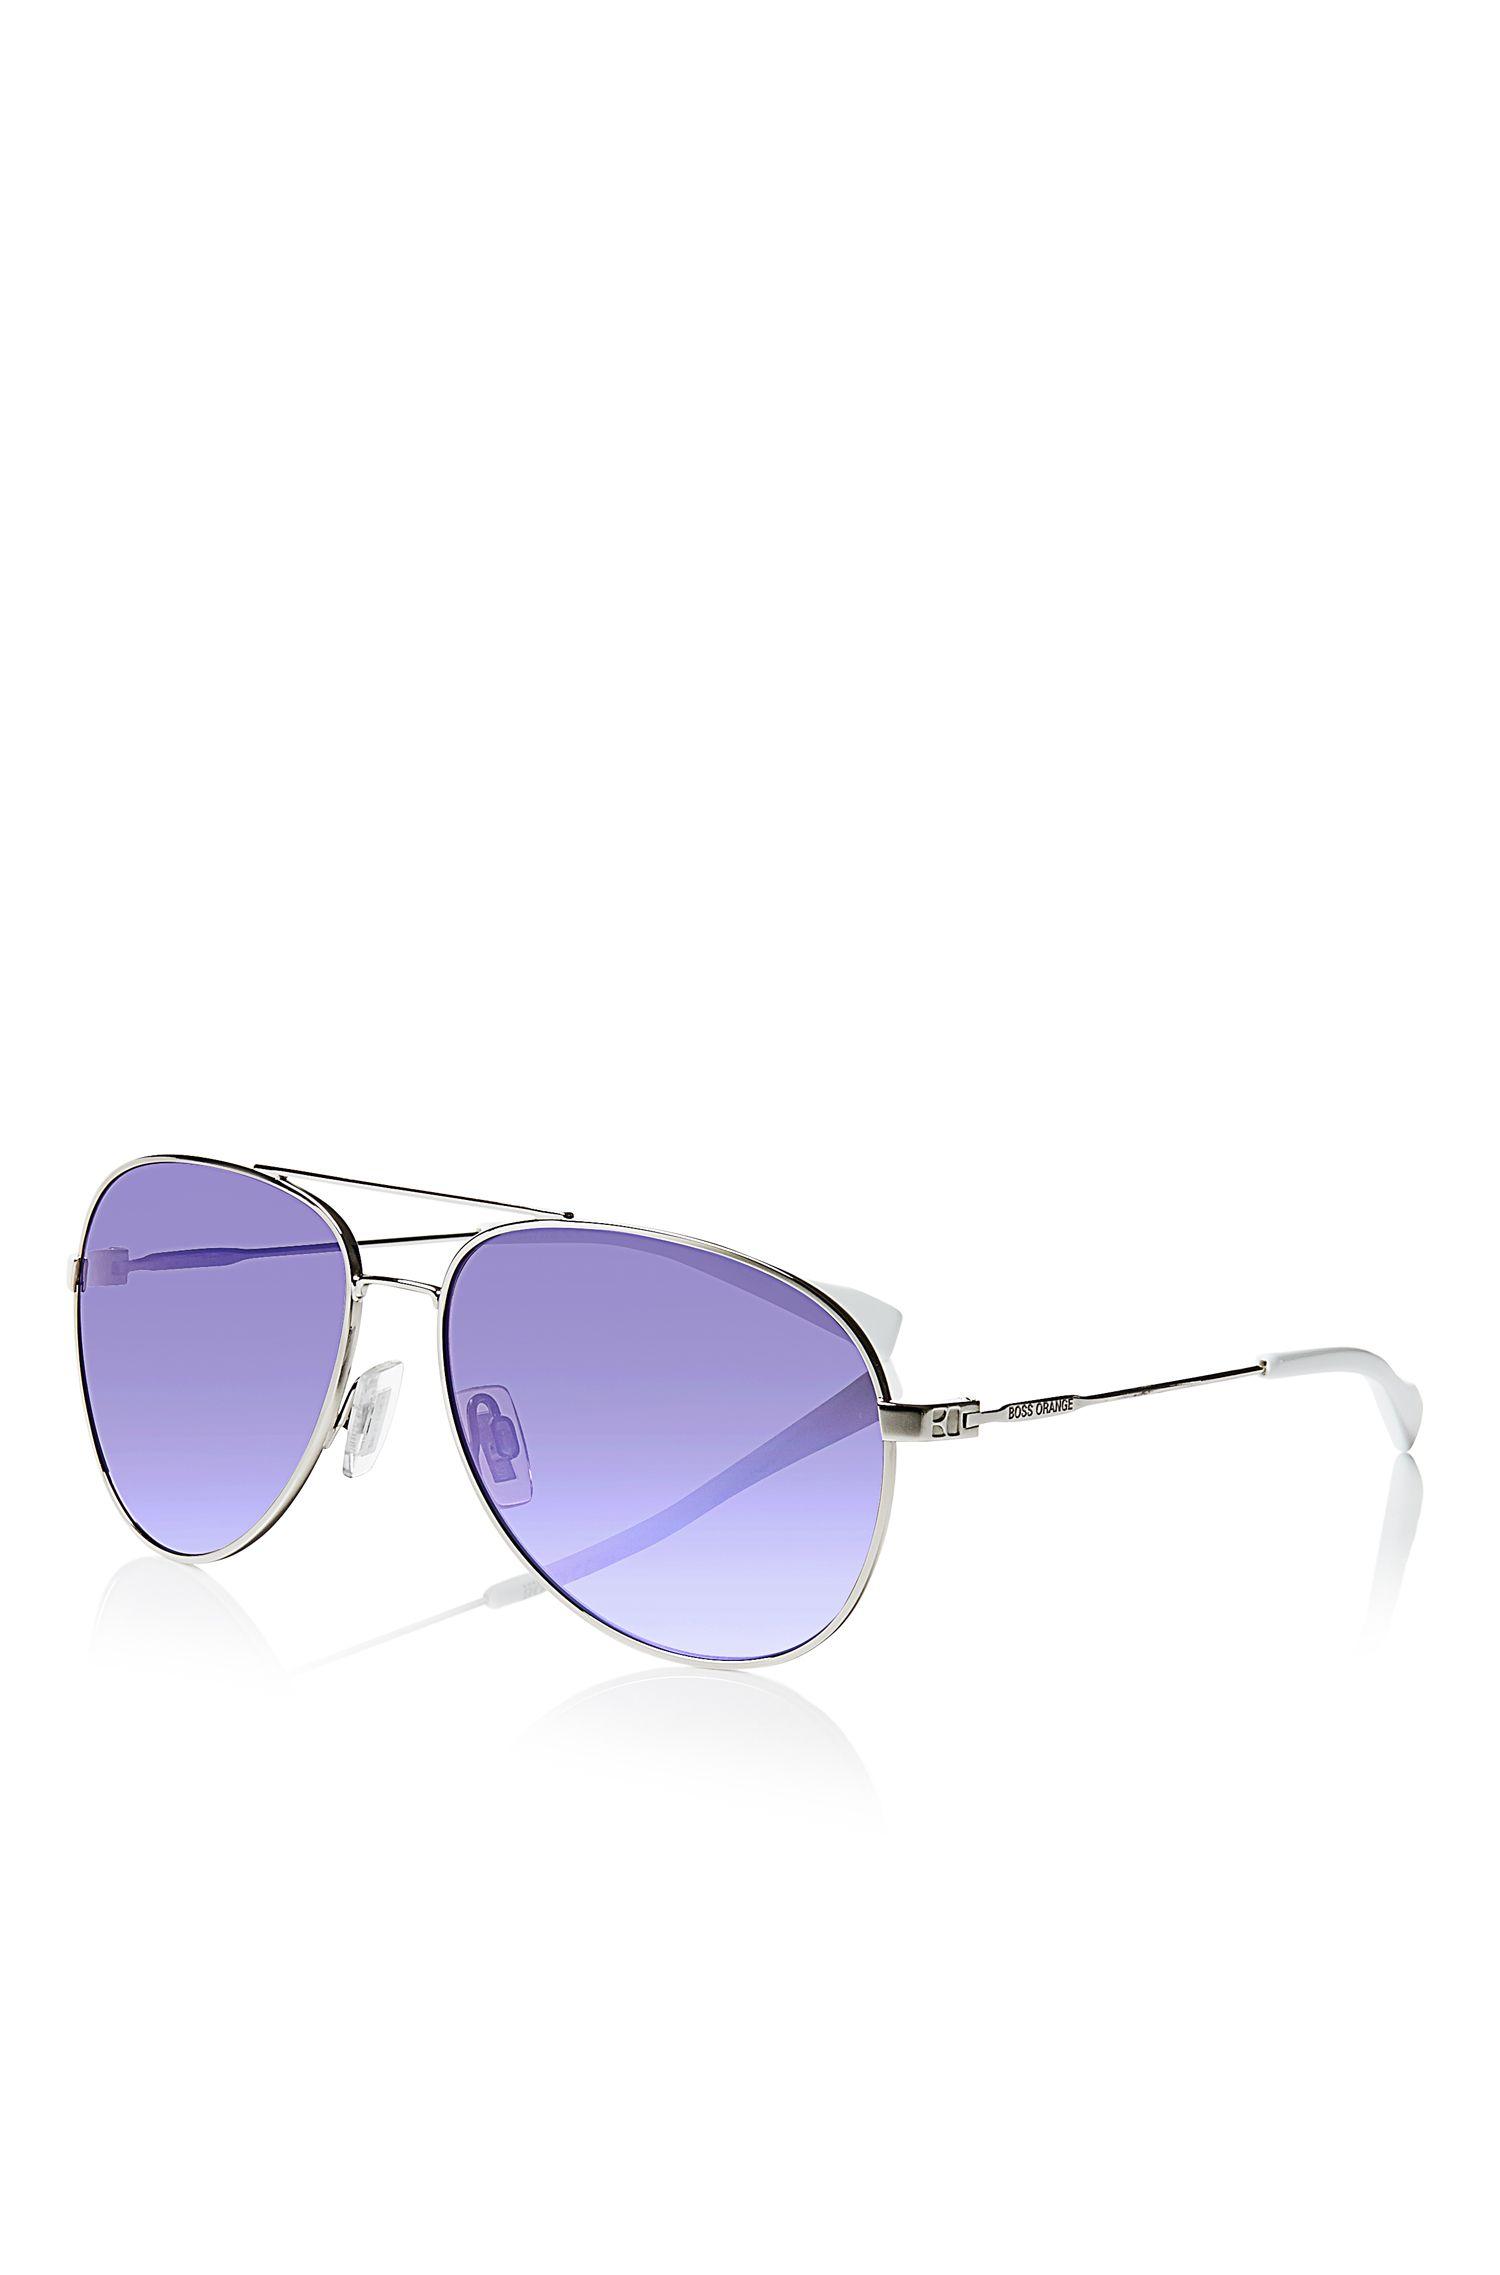 'Sunglasses' | Silver Metal Aviator Sunglasses